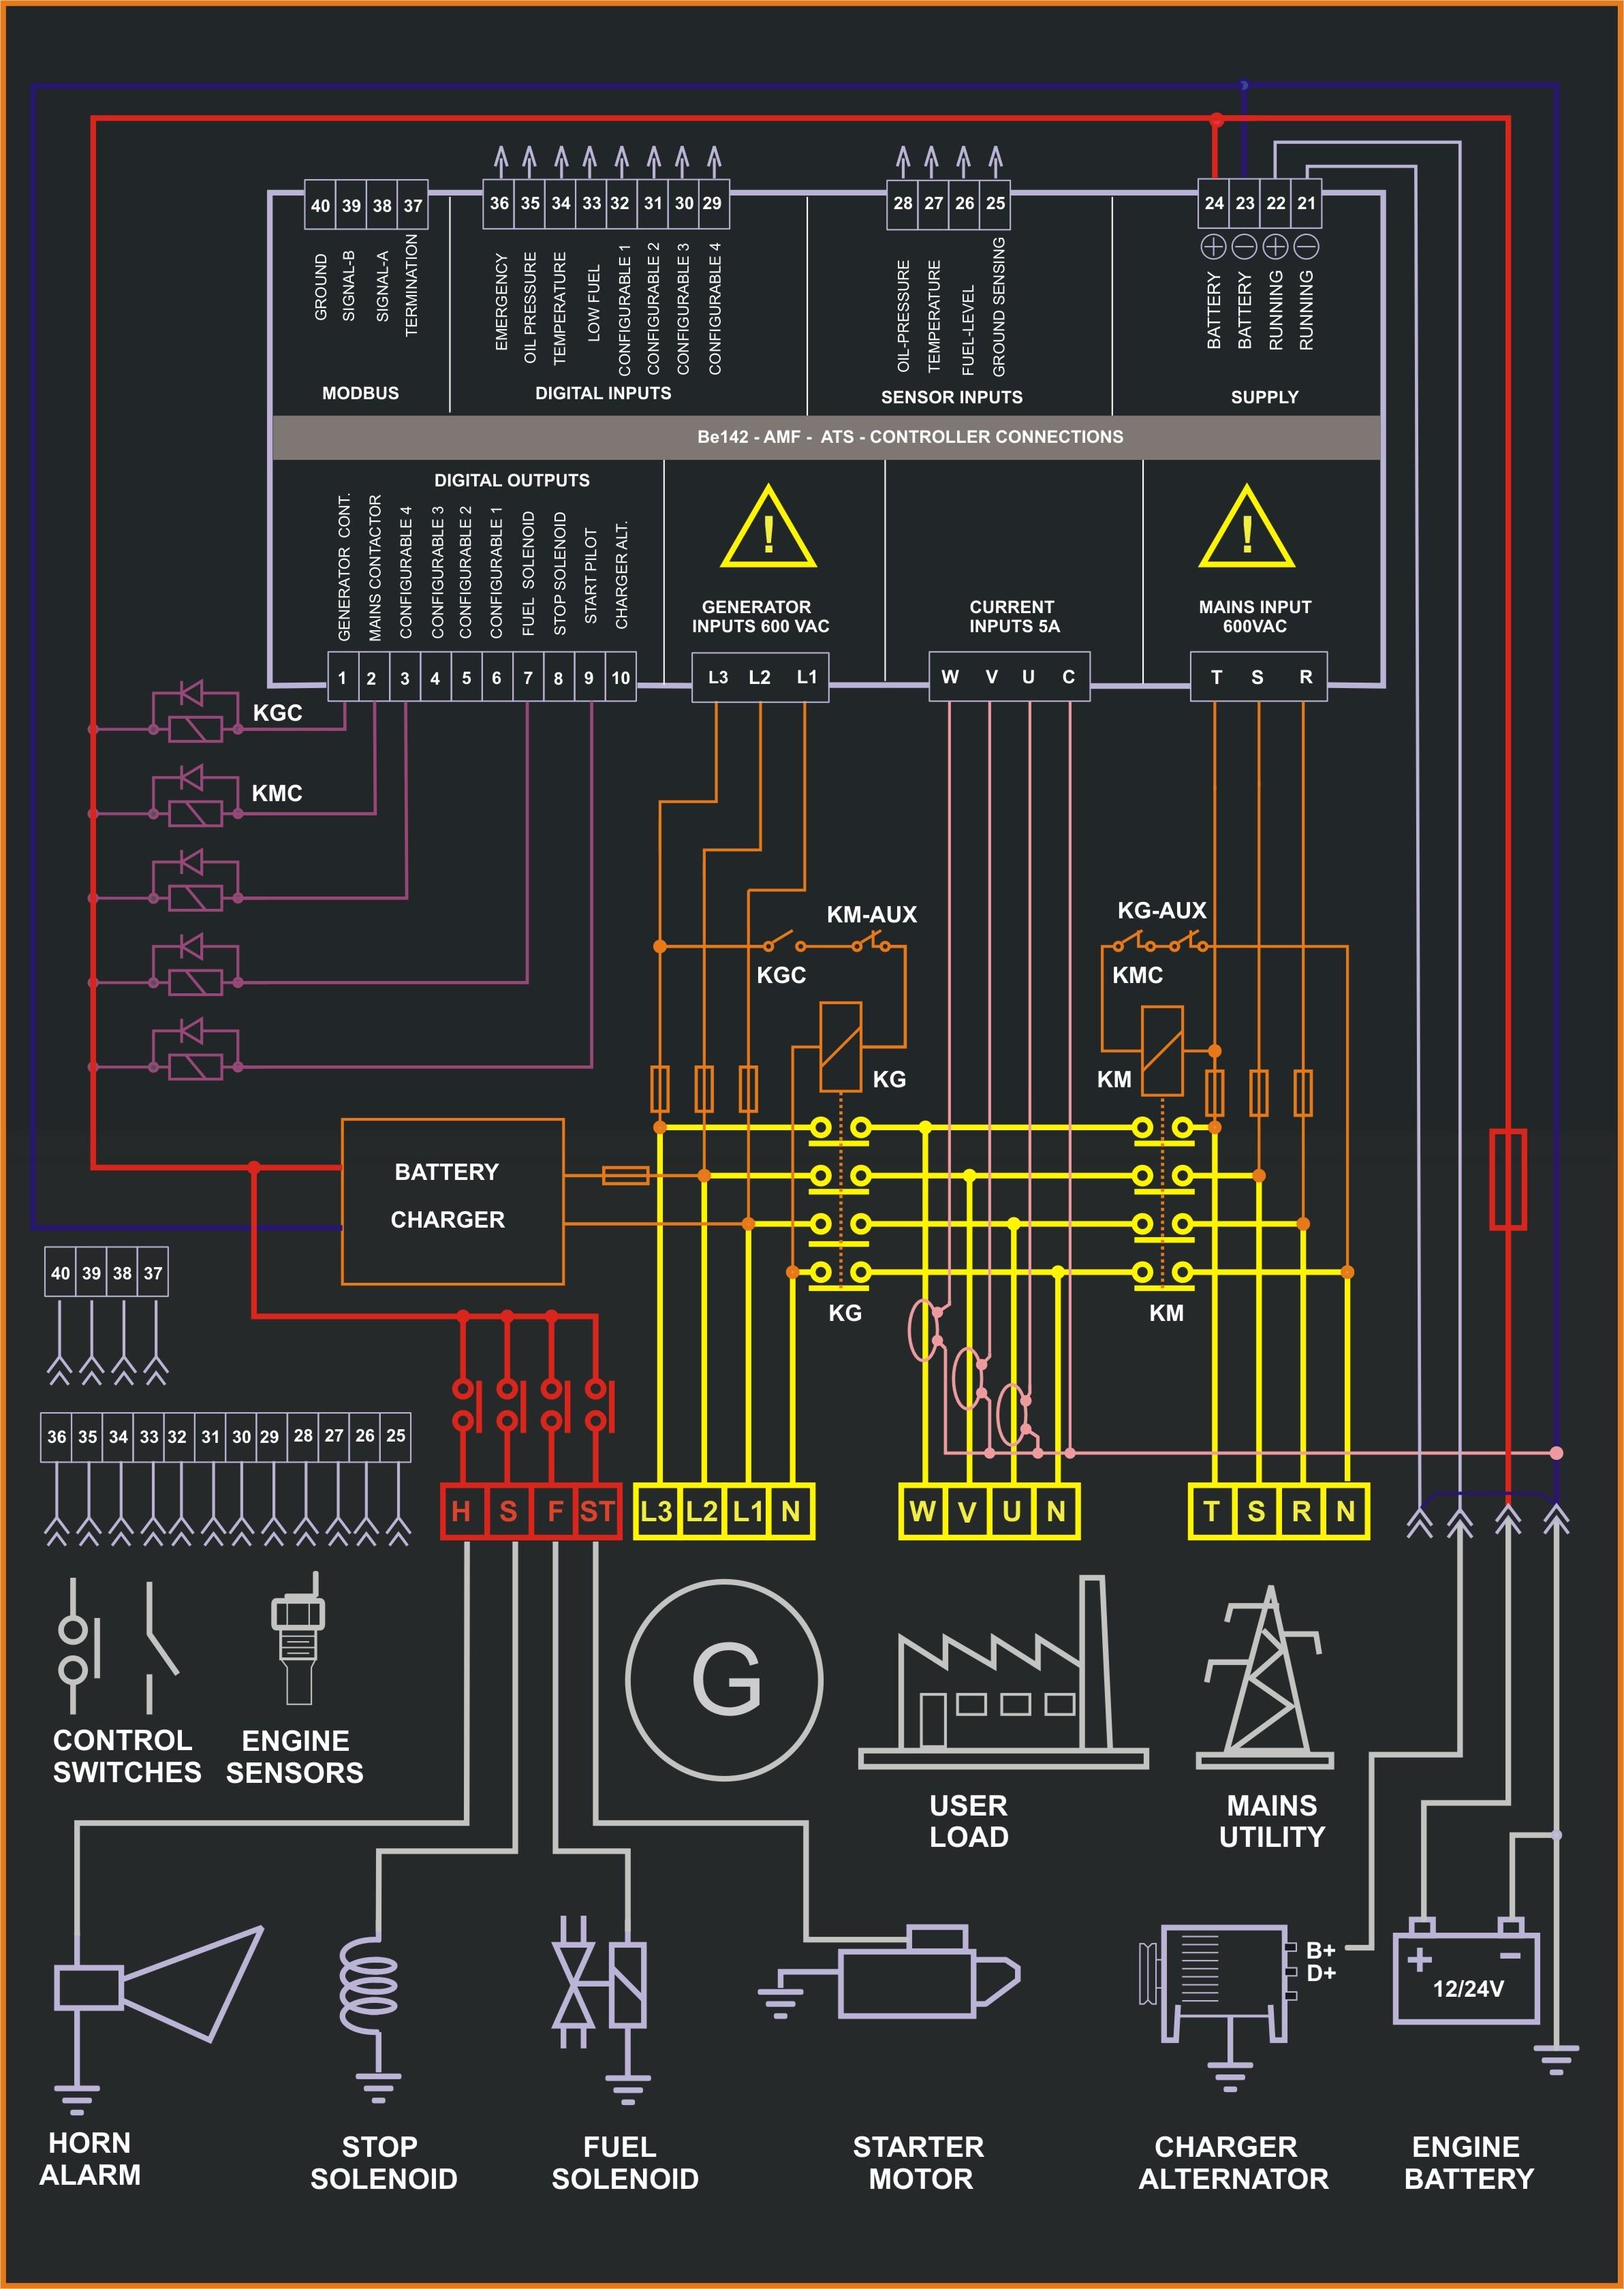 free download gax30 wiring diagram ch 7771  amf control panel circuit diagram pdf bek3 controller  amf control panel circuit diagram pdf